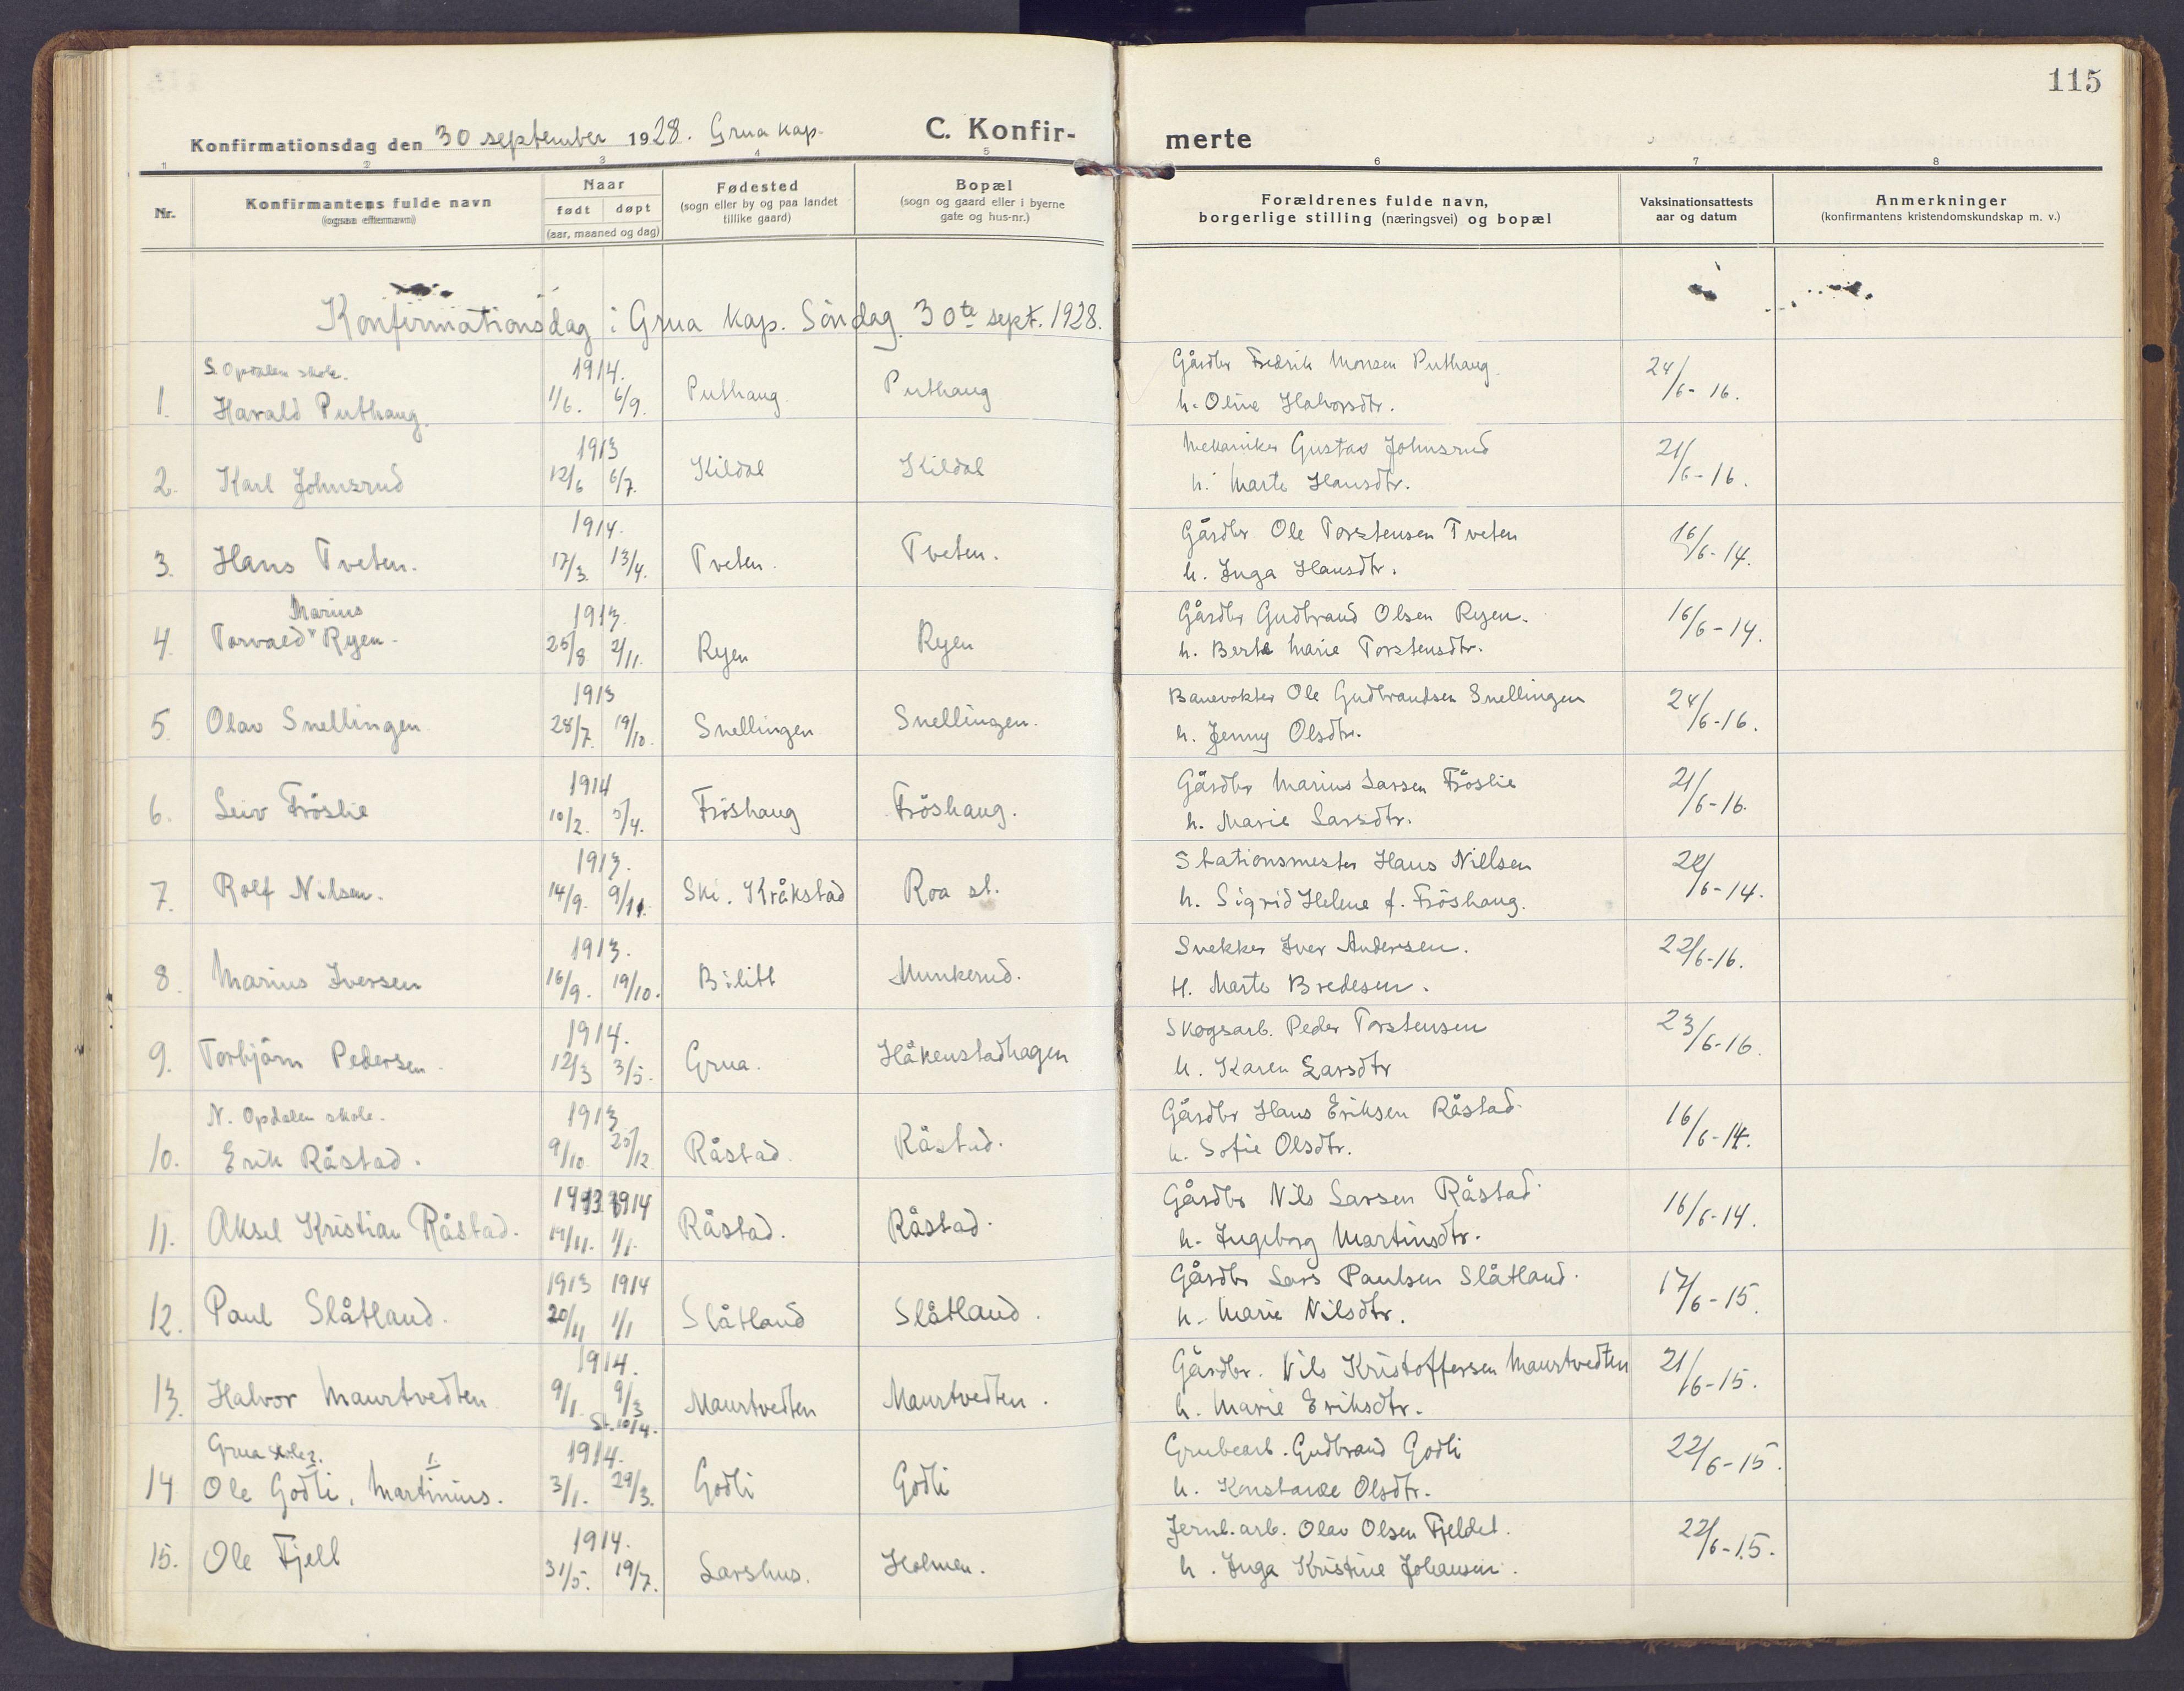 SAH, Lunner prestekontor, H/Ha/Haa/L0002: Ministerialbok nr. 2, 1922-1931, s. 115